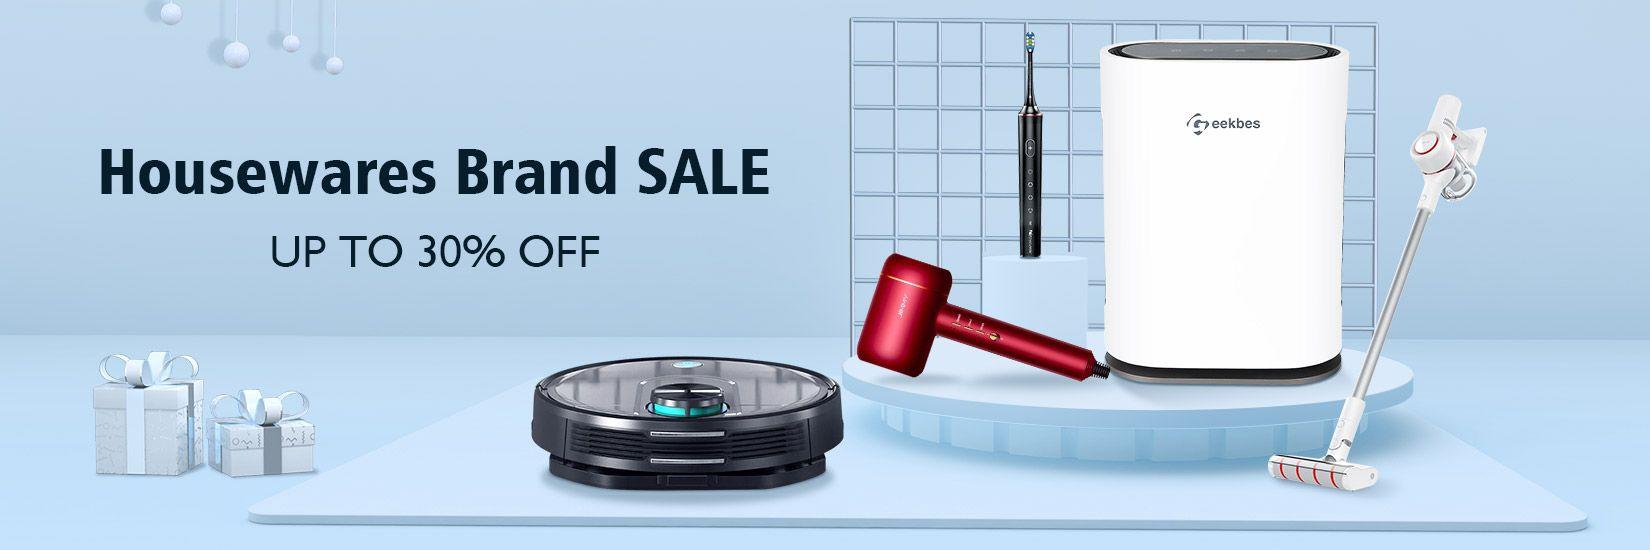 Home Appliance Brand SALE